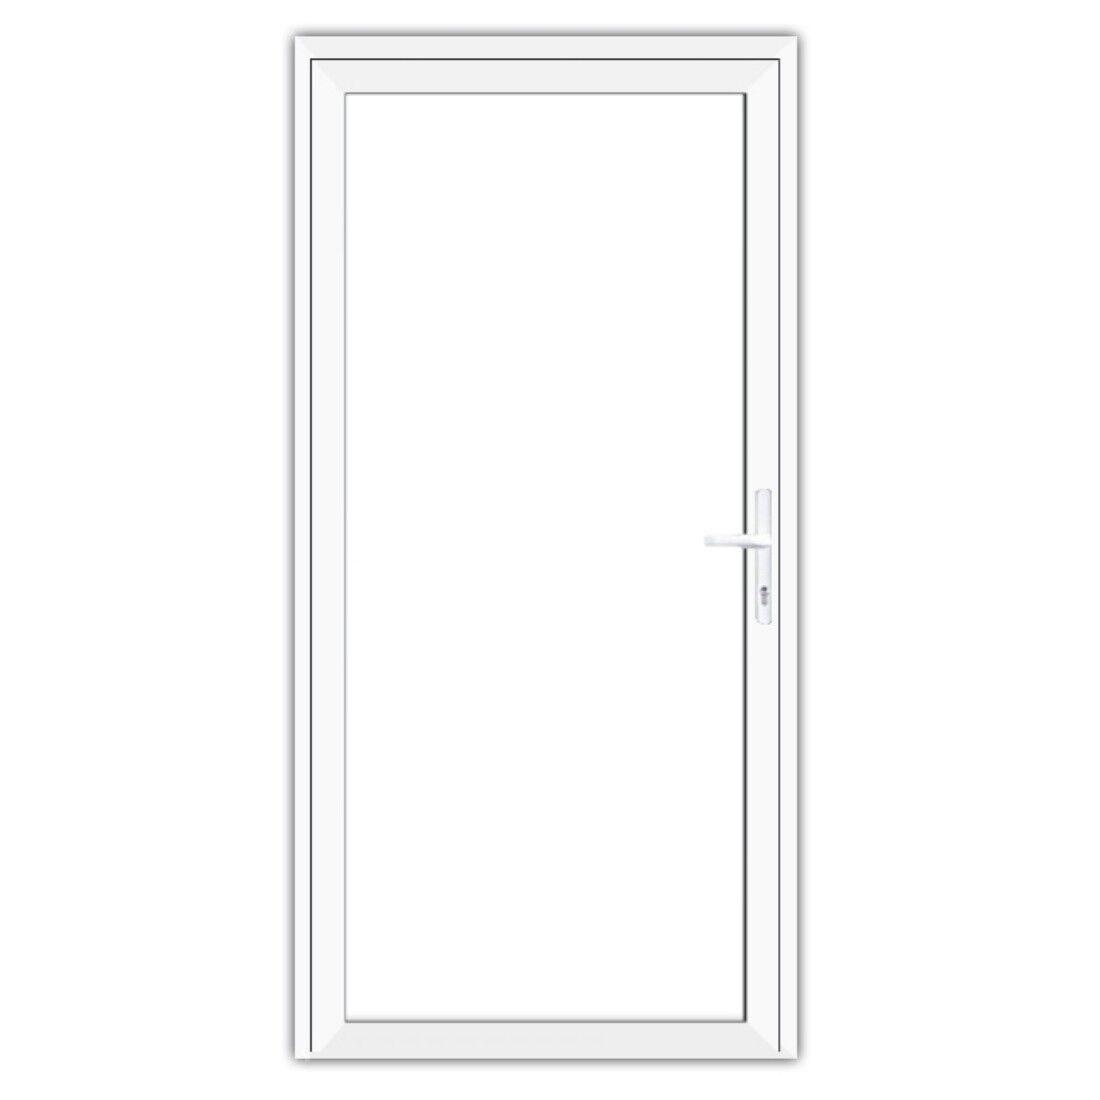 Aluminium Nebentür Nebeneingangstür Glastür Komplettglas innenöffnend Klarglas